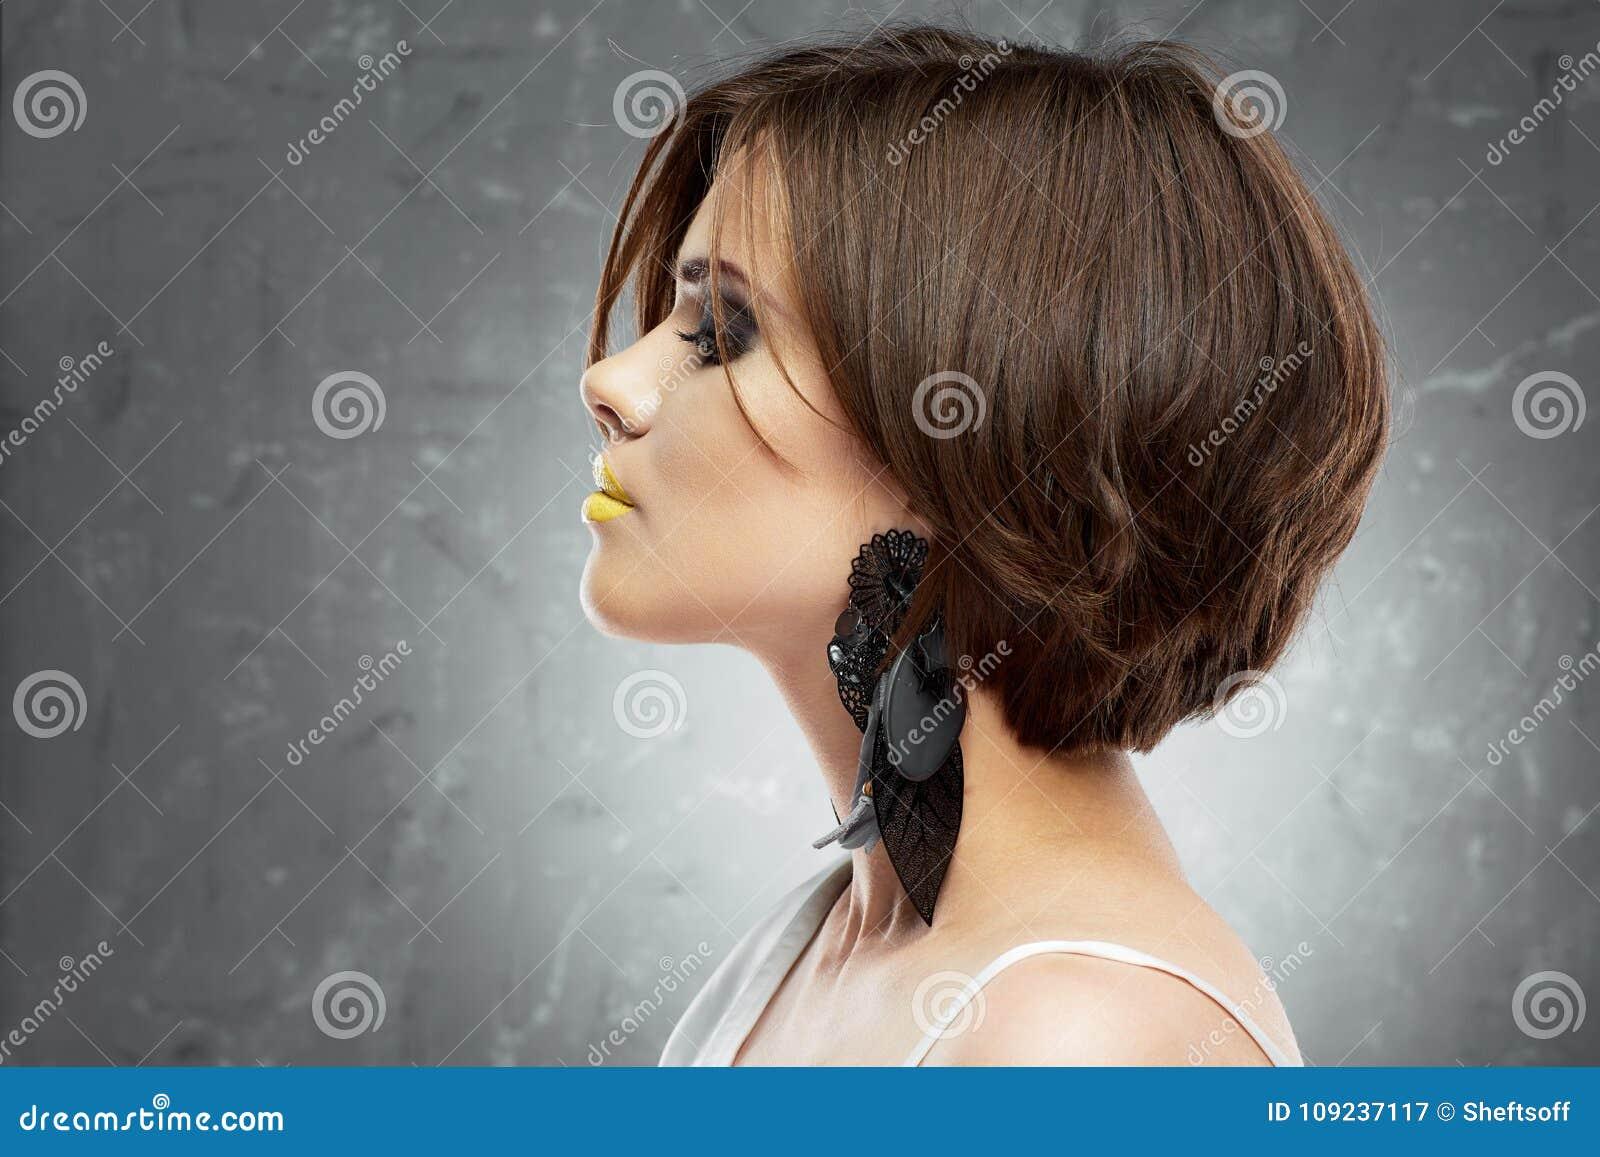 Woman Face Bob Haircut Profile View Beauty Face Short Hair